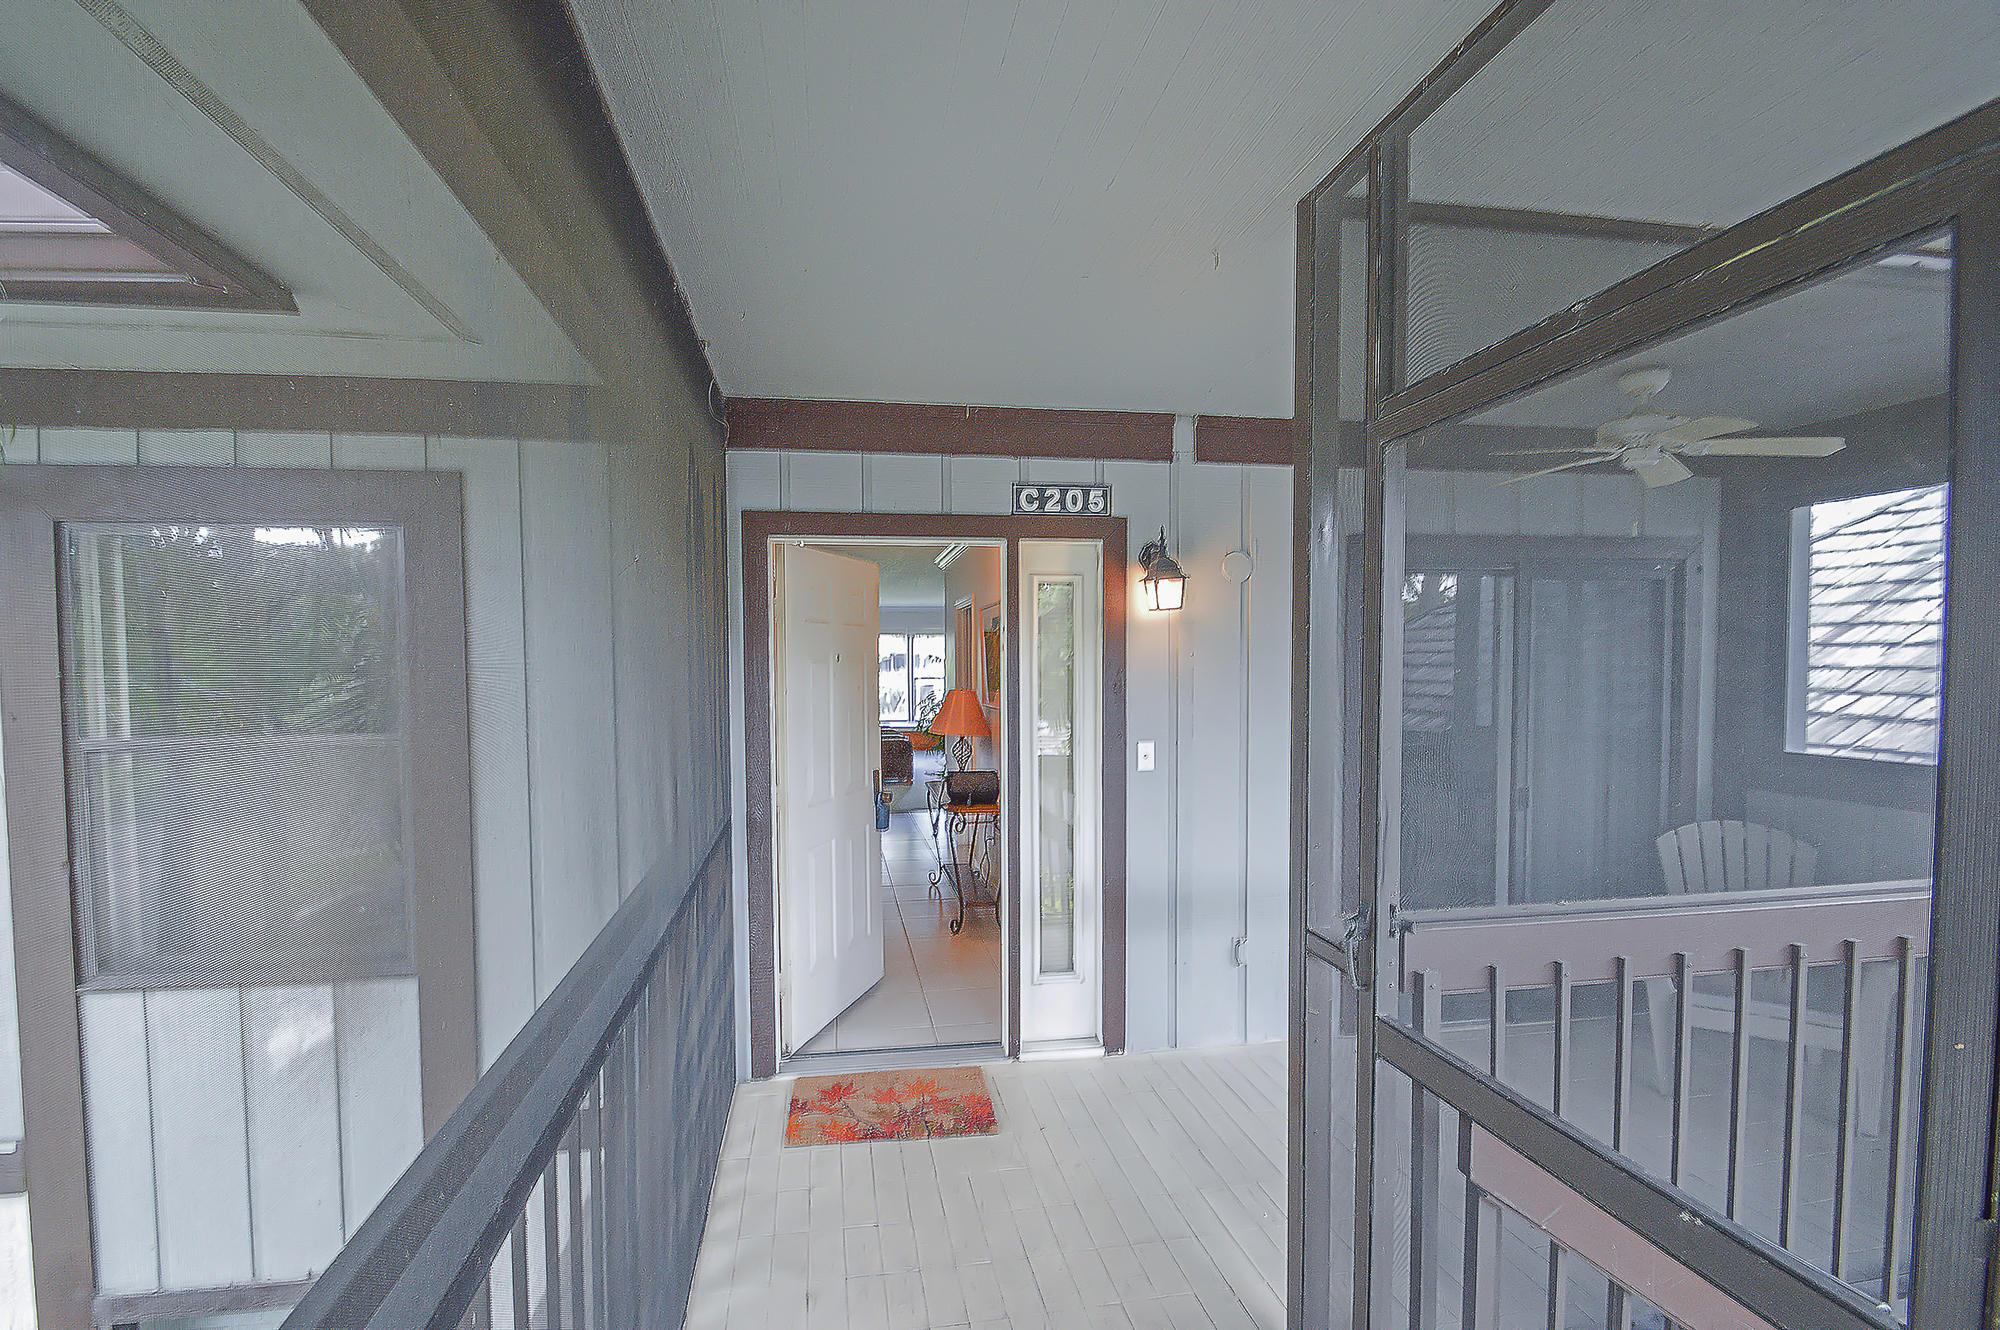 13307 Polo Club Road, Wellington, Florida 33414, 3 Bedrooms Bedrooms, ,3 BathroomsBathrooms,Condo/Coop,For Rent,PALM BEACH POLO & CC,Polo Club,2,RX-10523405